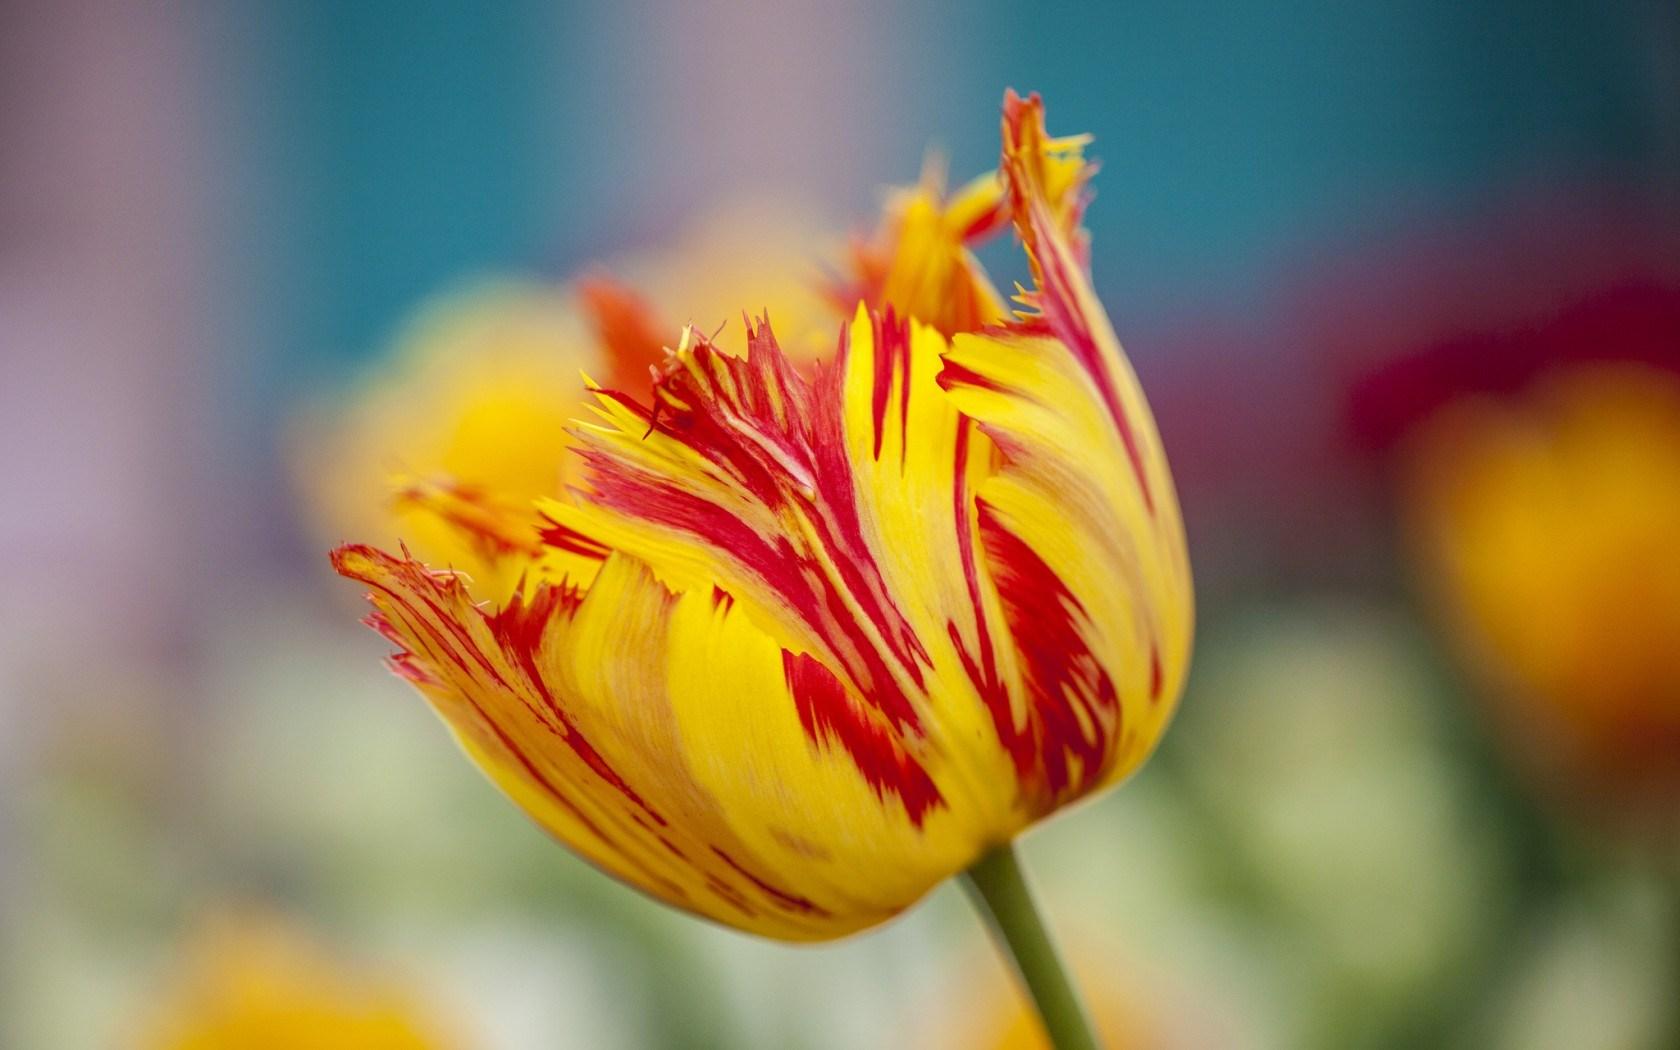 Flower Tulip Spring Yellow Orange